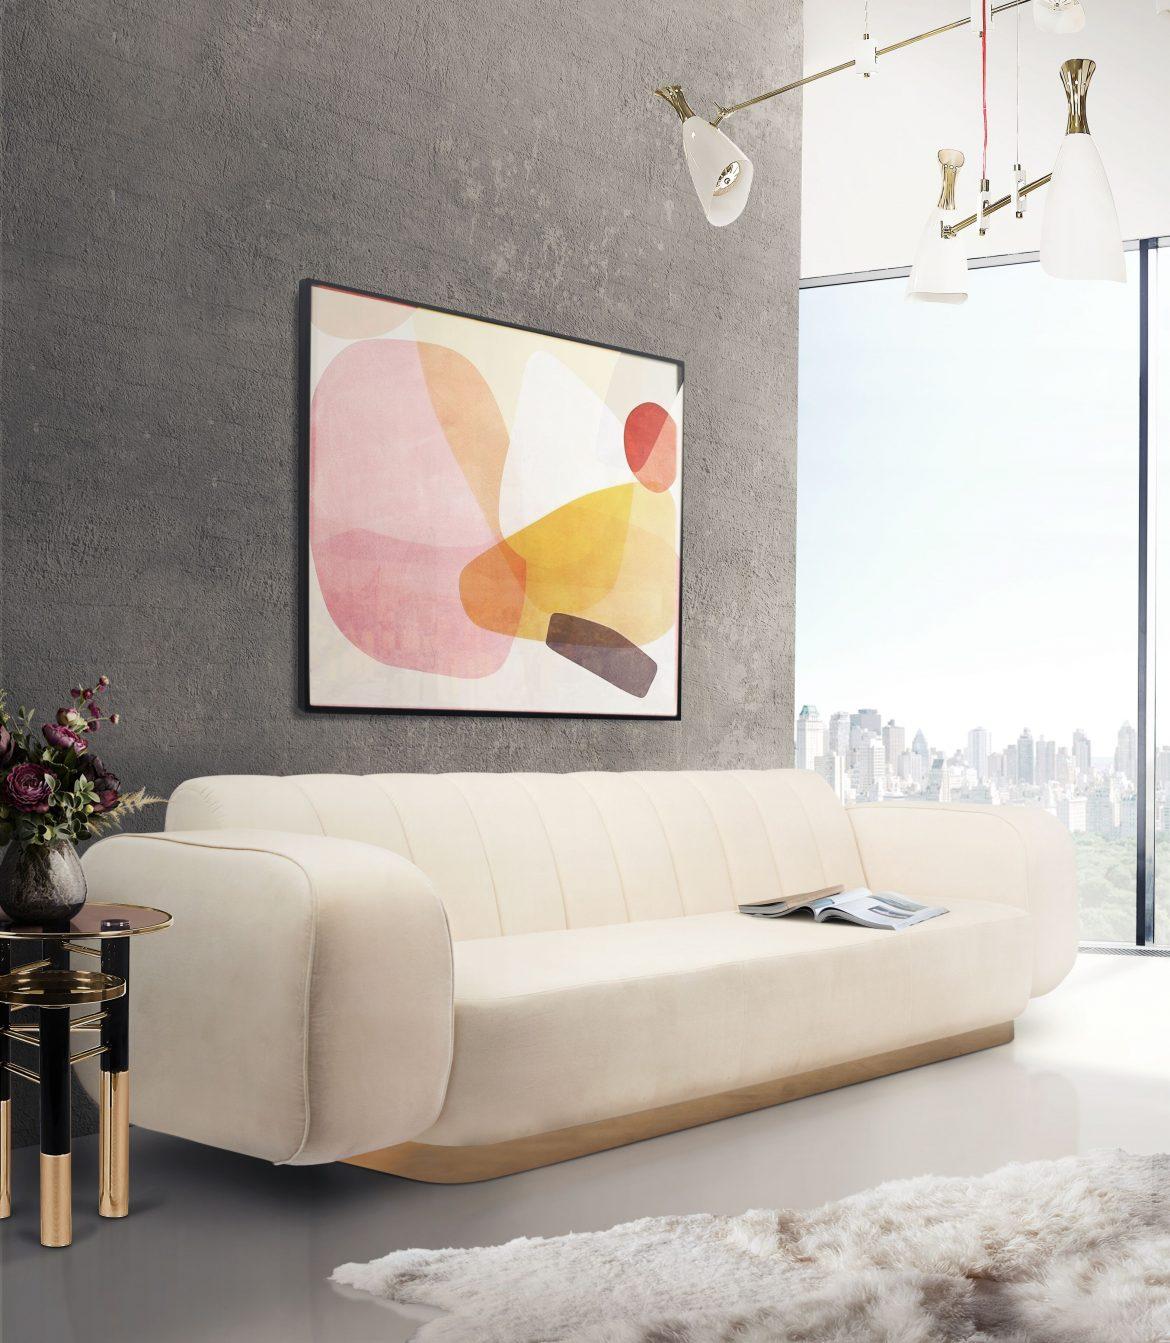 living room ideas 30 Best Living Room Ideas For 2020 best living room ideas 2020 26